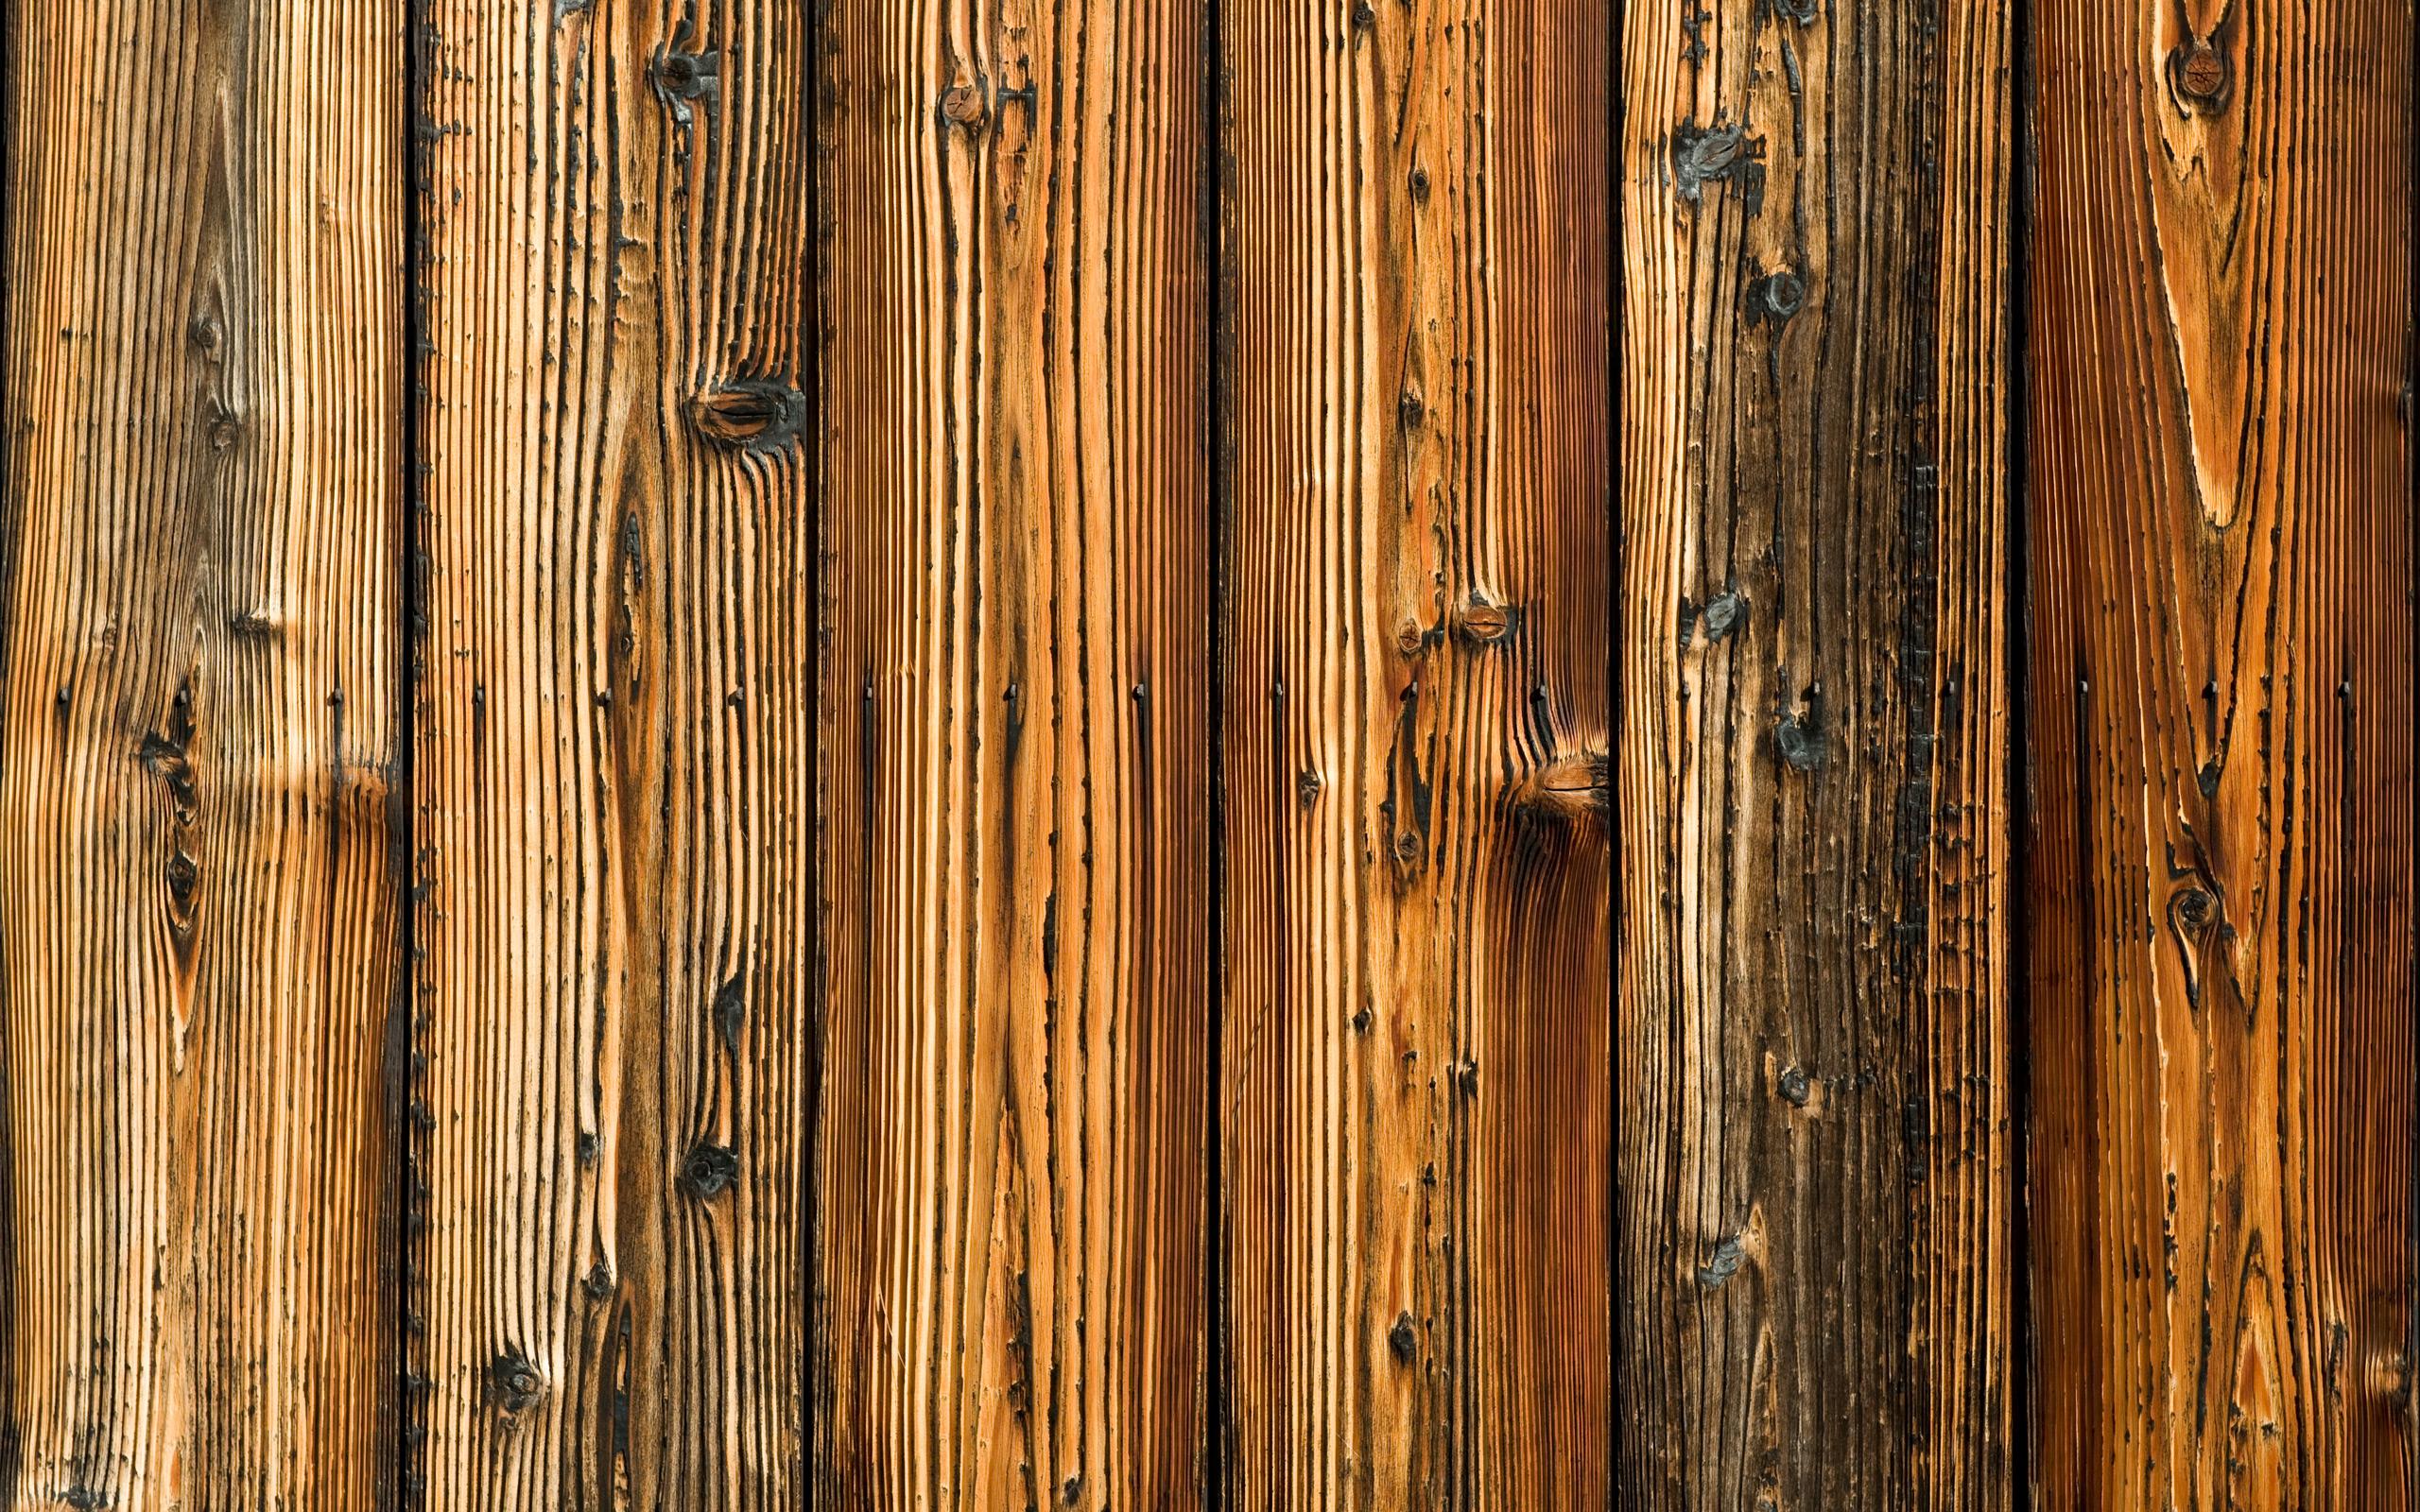 Wood Grain Images Free